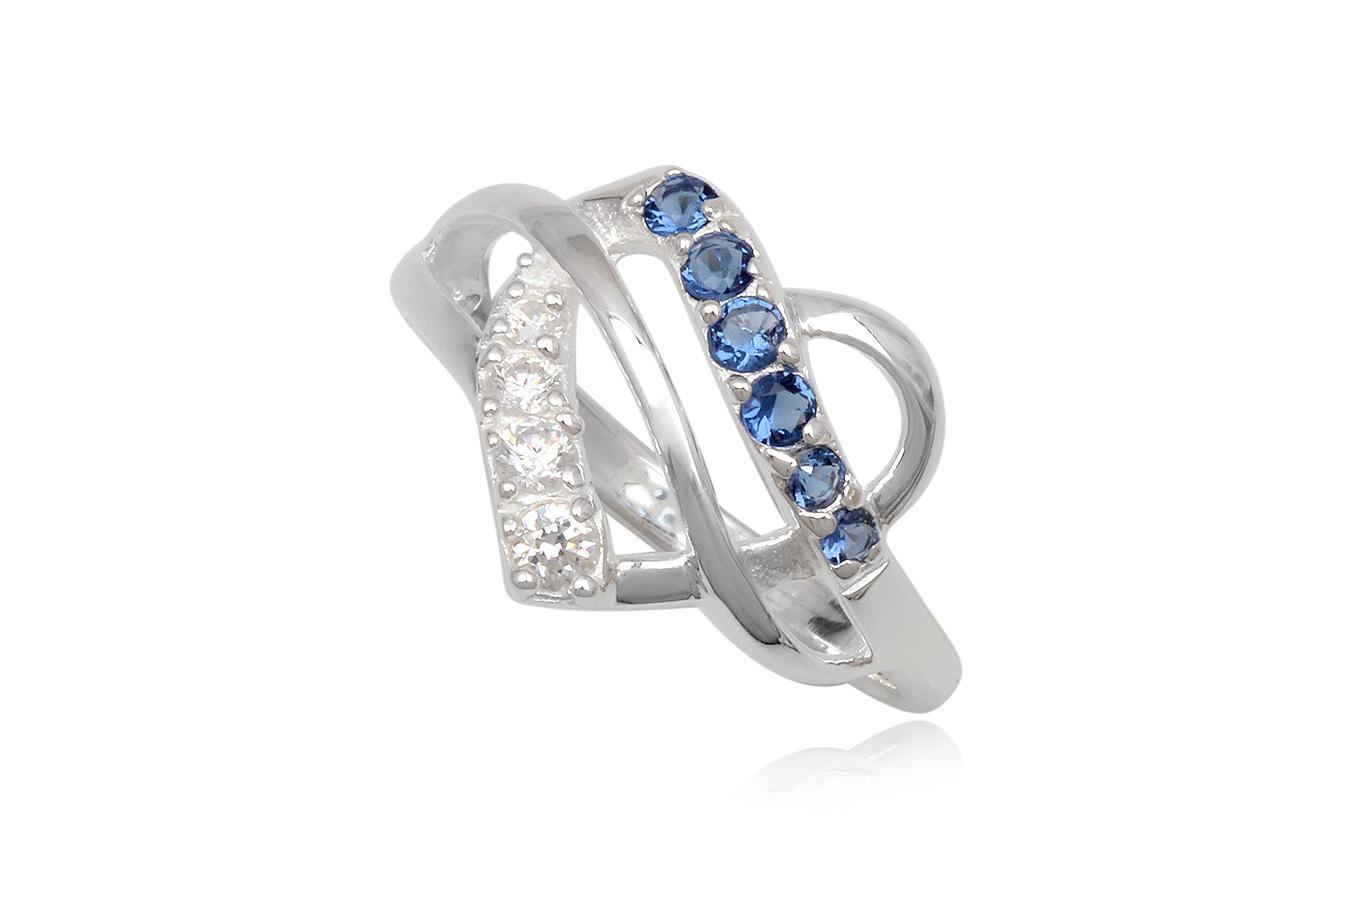 inel inima din argint cu zirconii